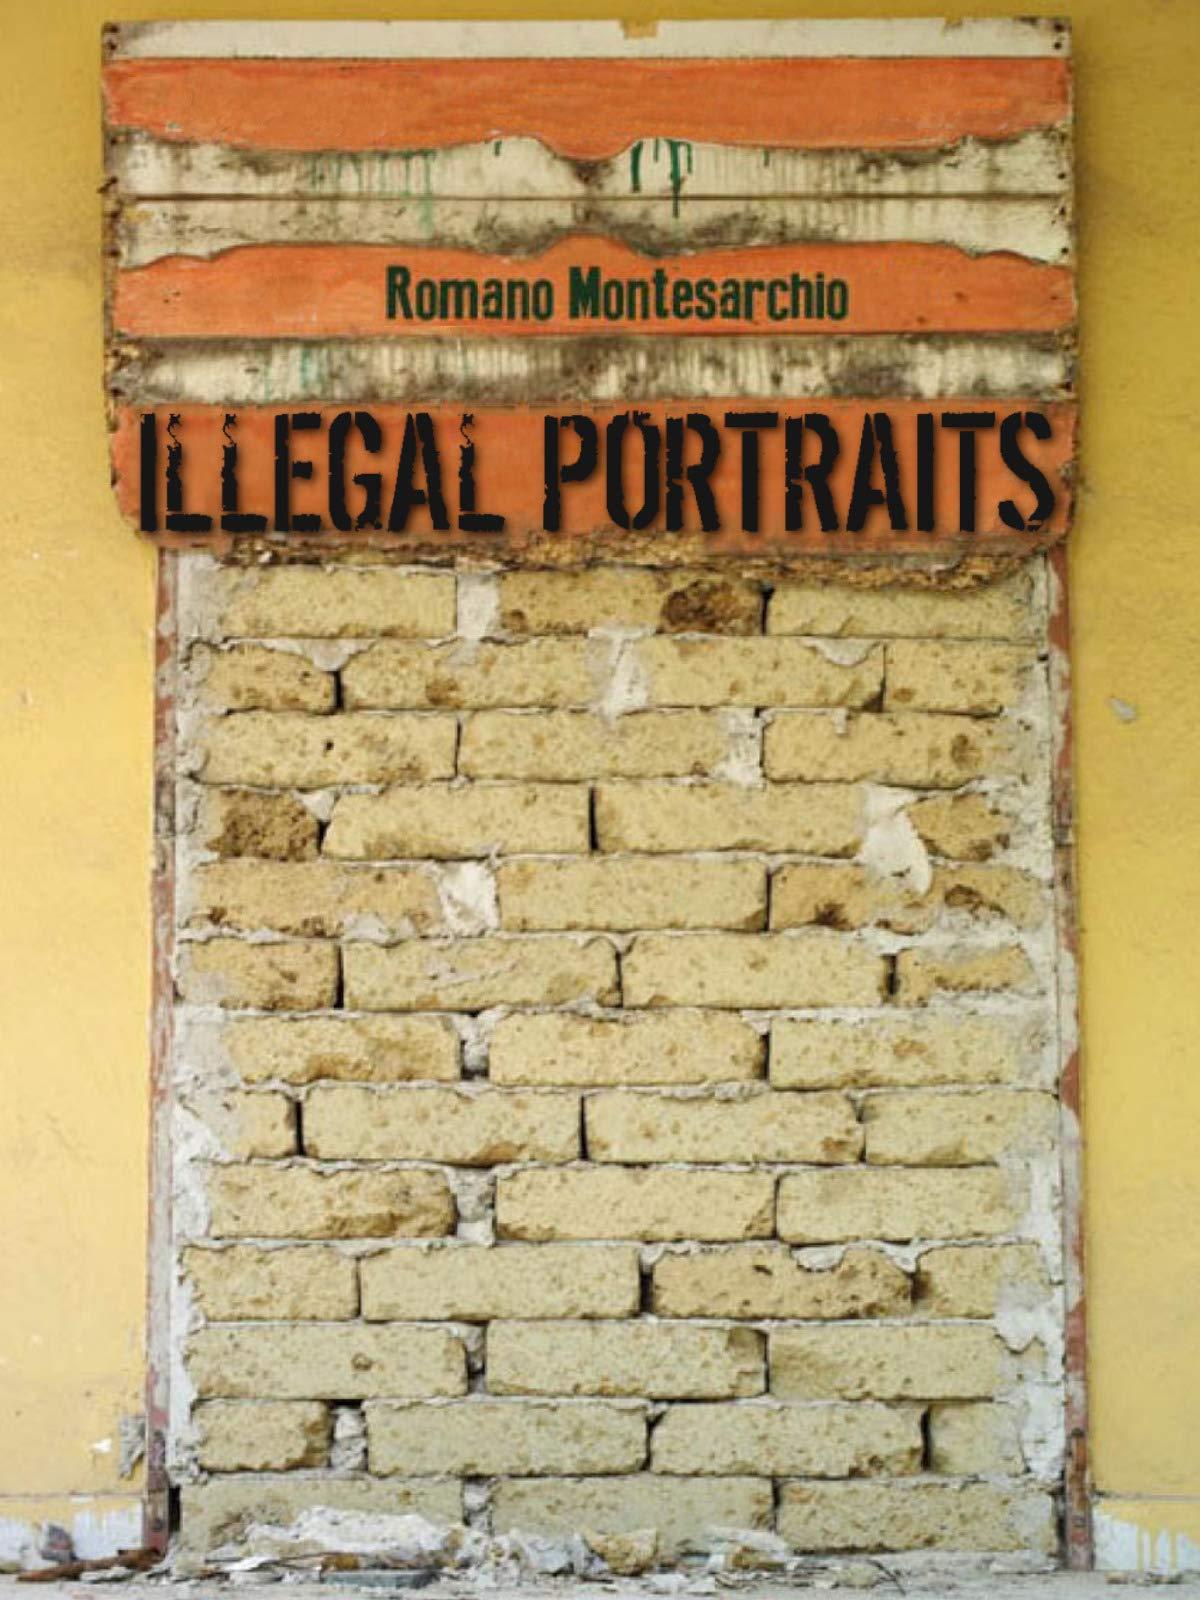 Illegal Portraits